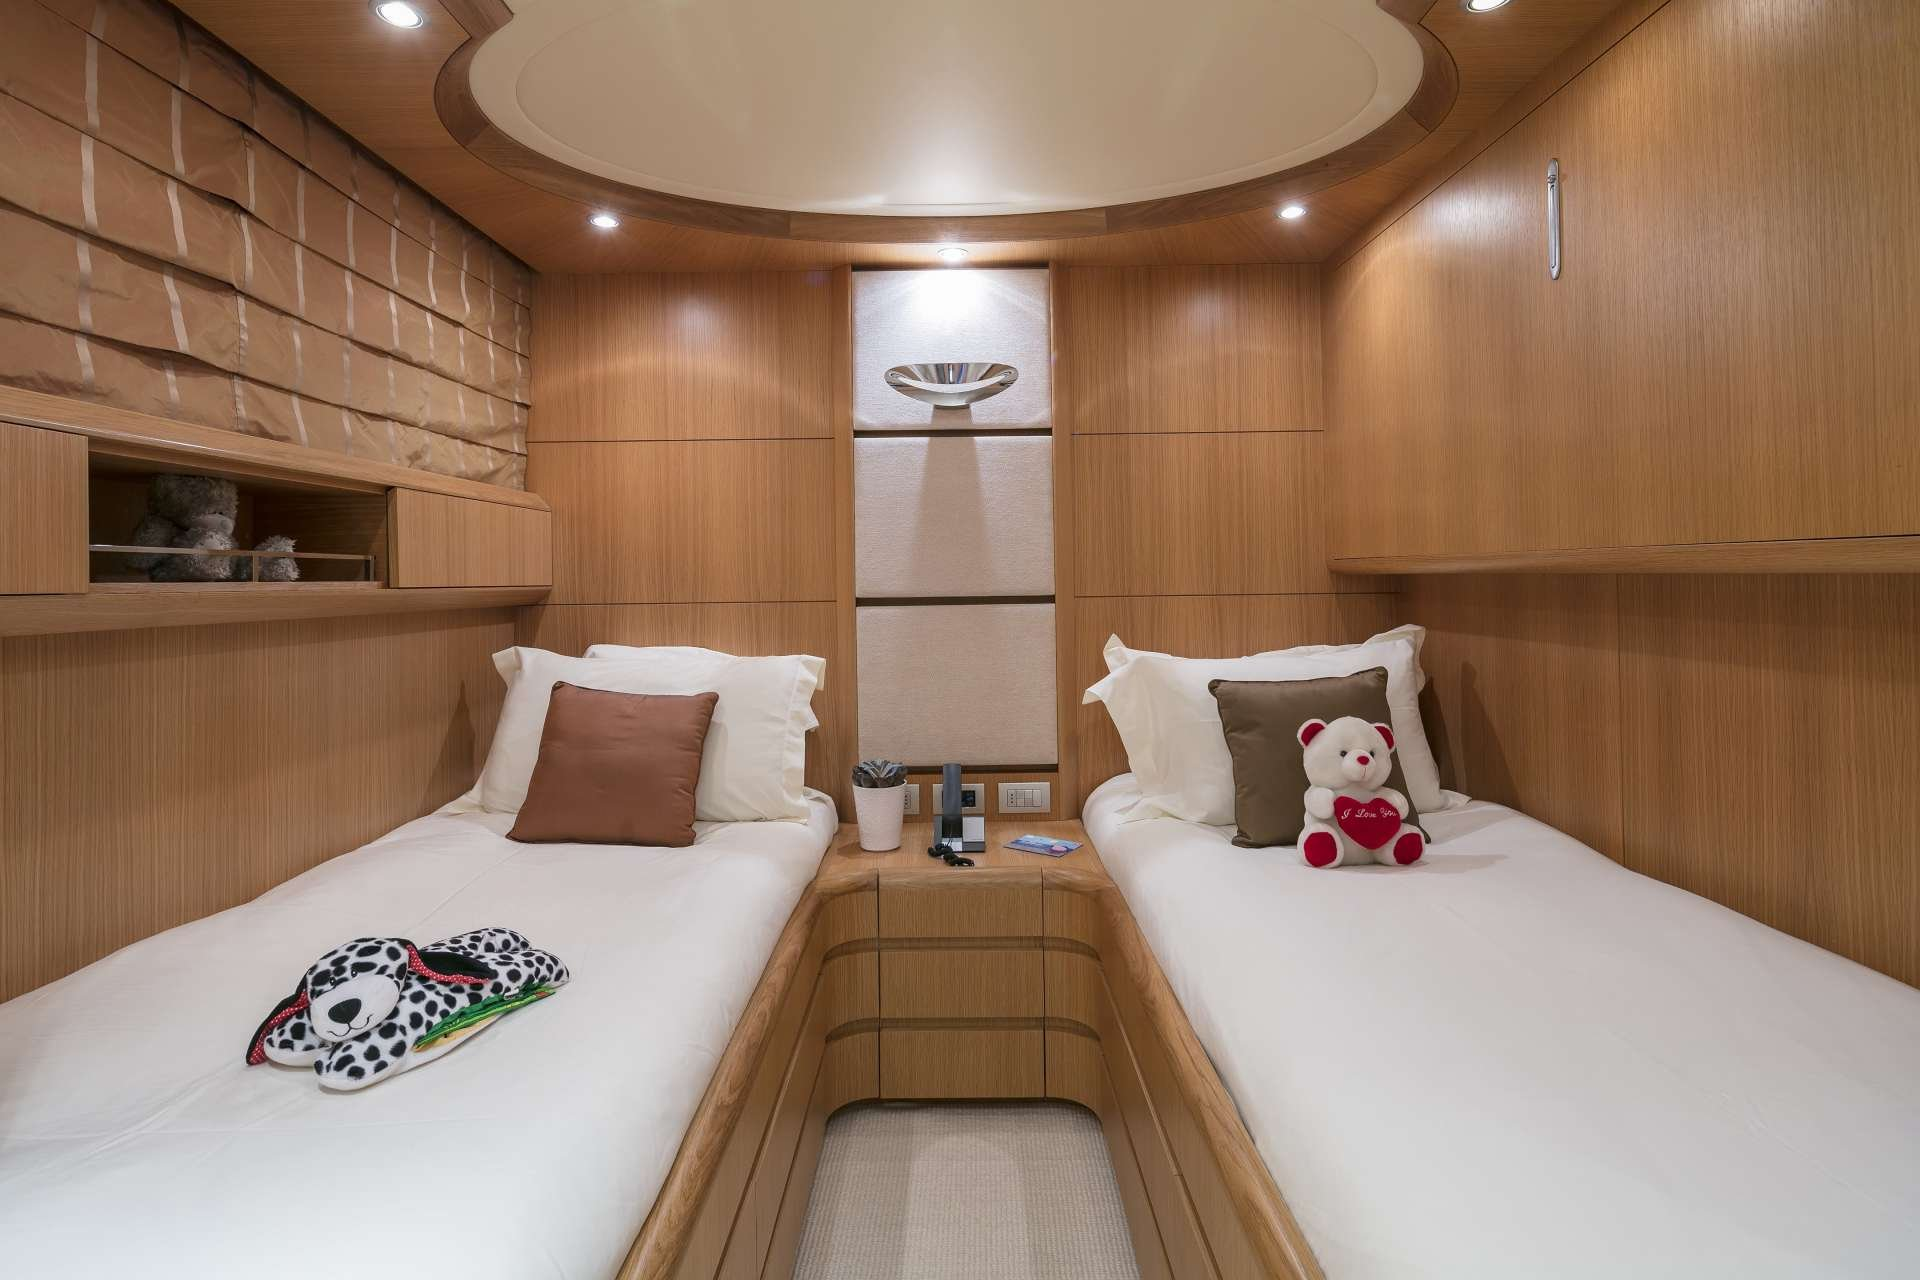 Motor Yacht 'PARIS A' Twin Stateroom, 12 PAX, 6 Crew, 115.00 Ft, 35.06 Meters, Built 2009, Majora, Refit Year 2013